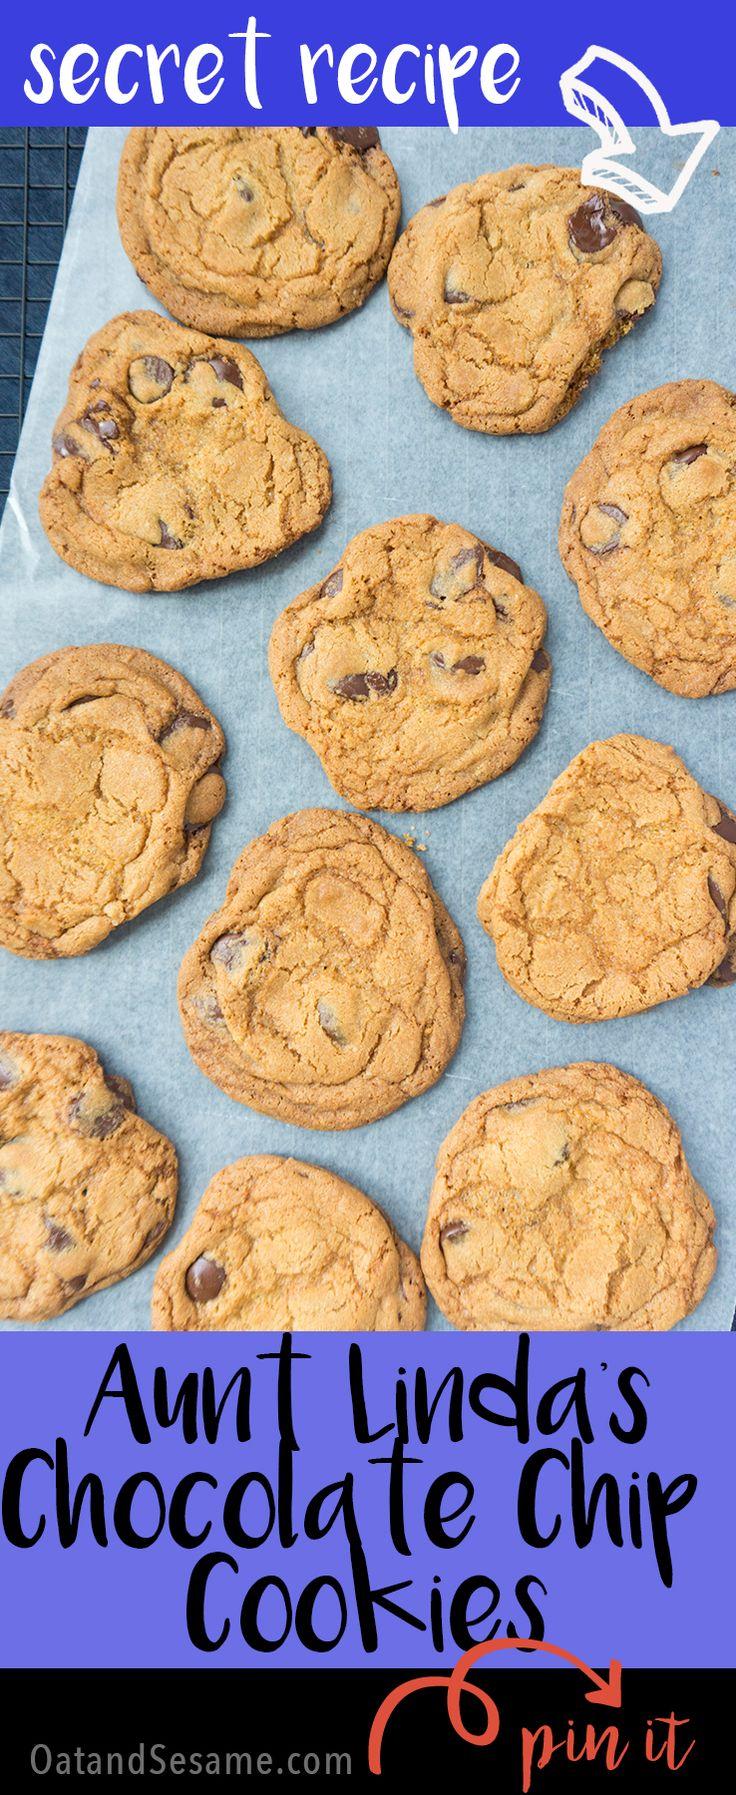 Aunt Linda's Secret Chocolate Chip Cookies - BIG, Chewy + Crisp | COOKIES | BAKING | DESSERT | Recipe at OatandSesame.com